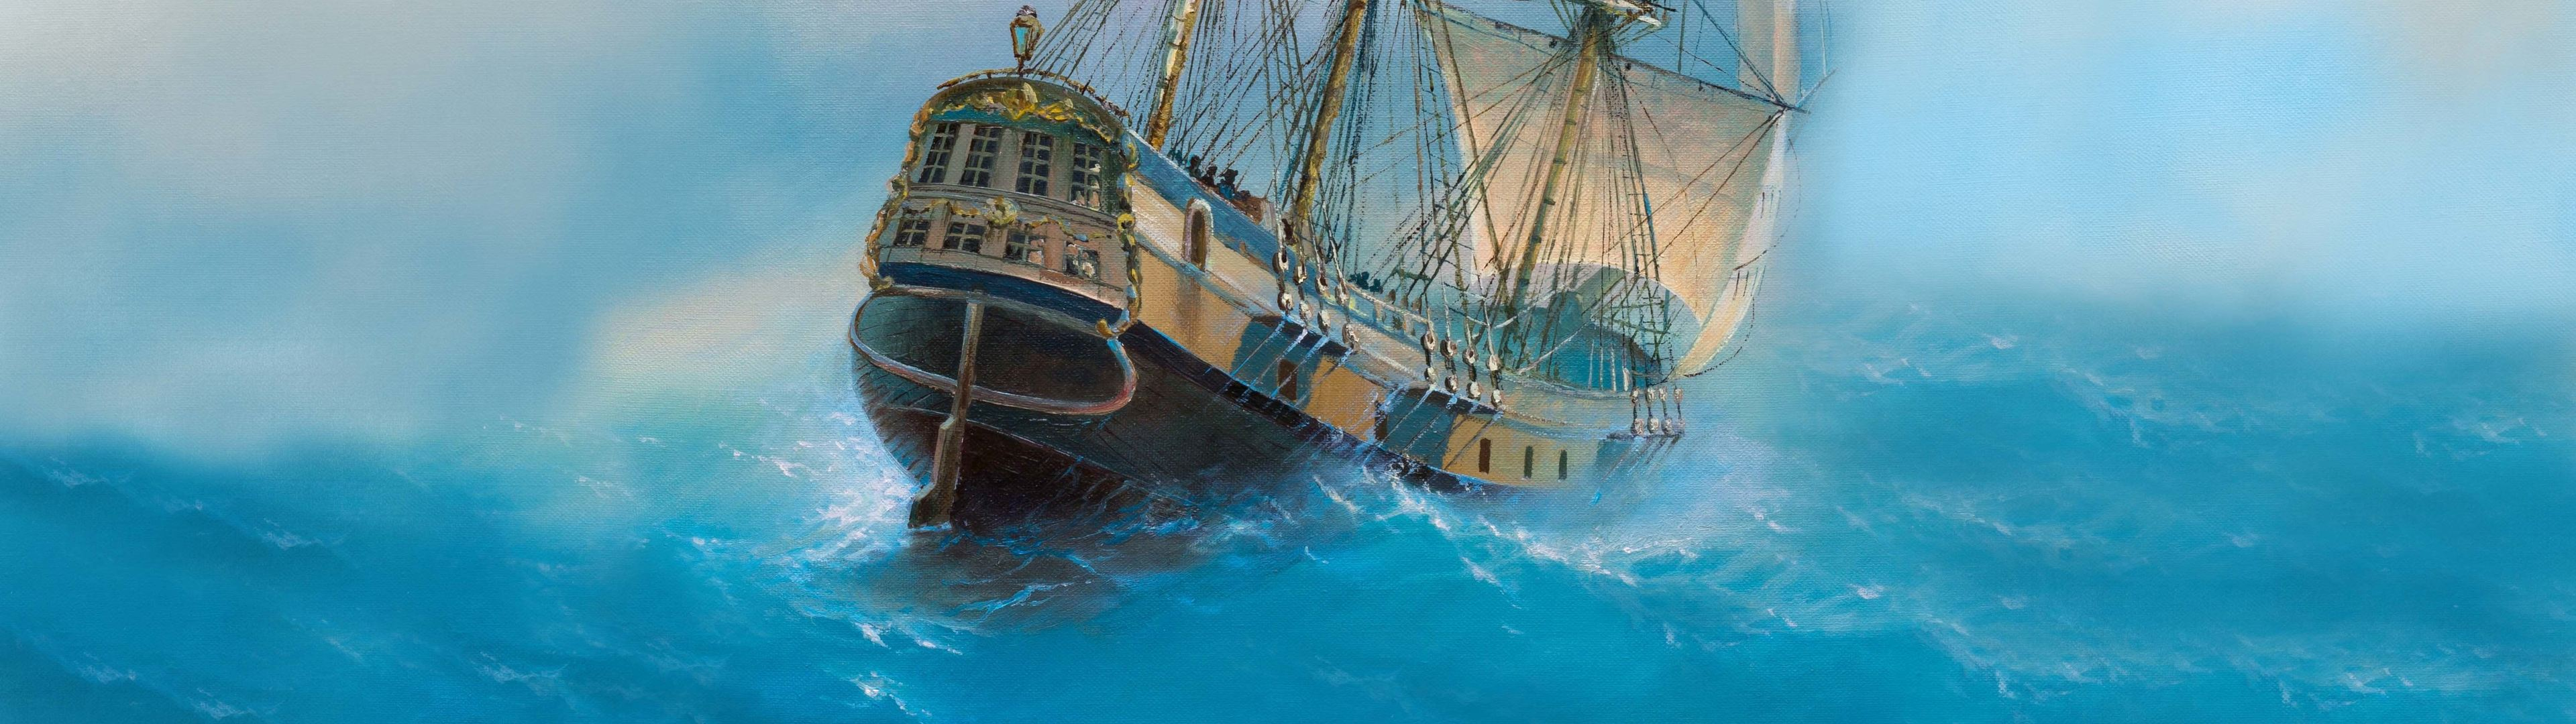 WallpaperFusion-sailing-ship-Original-6000x4500rc.jpg